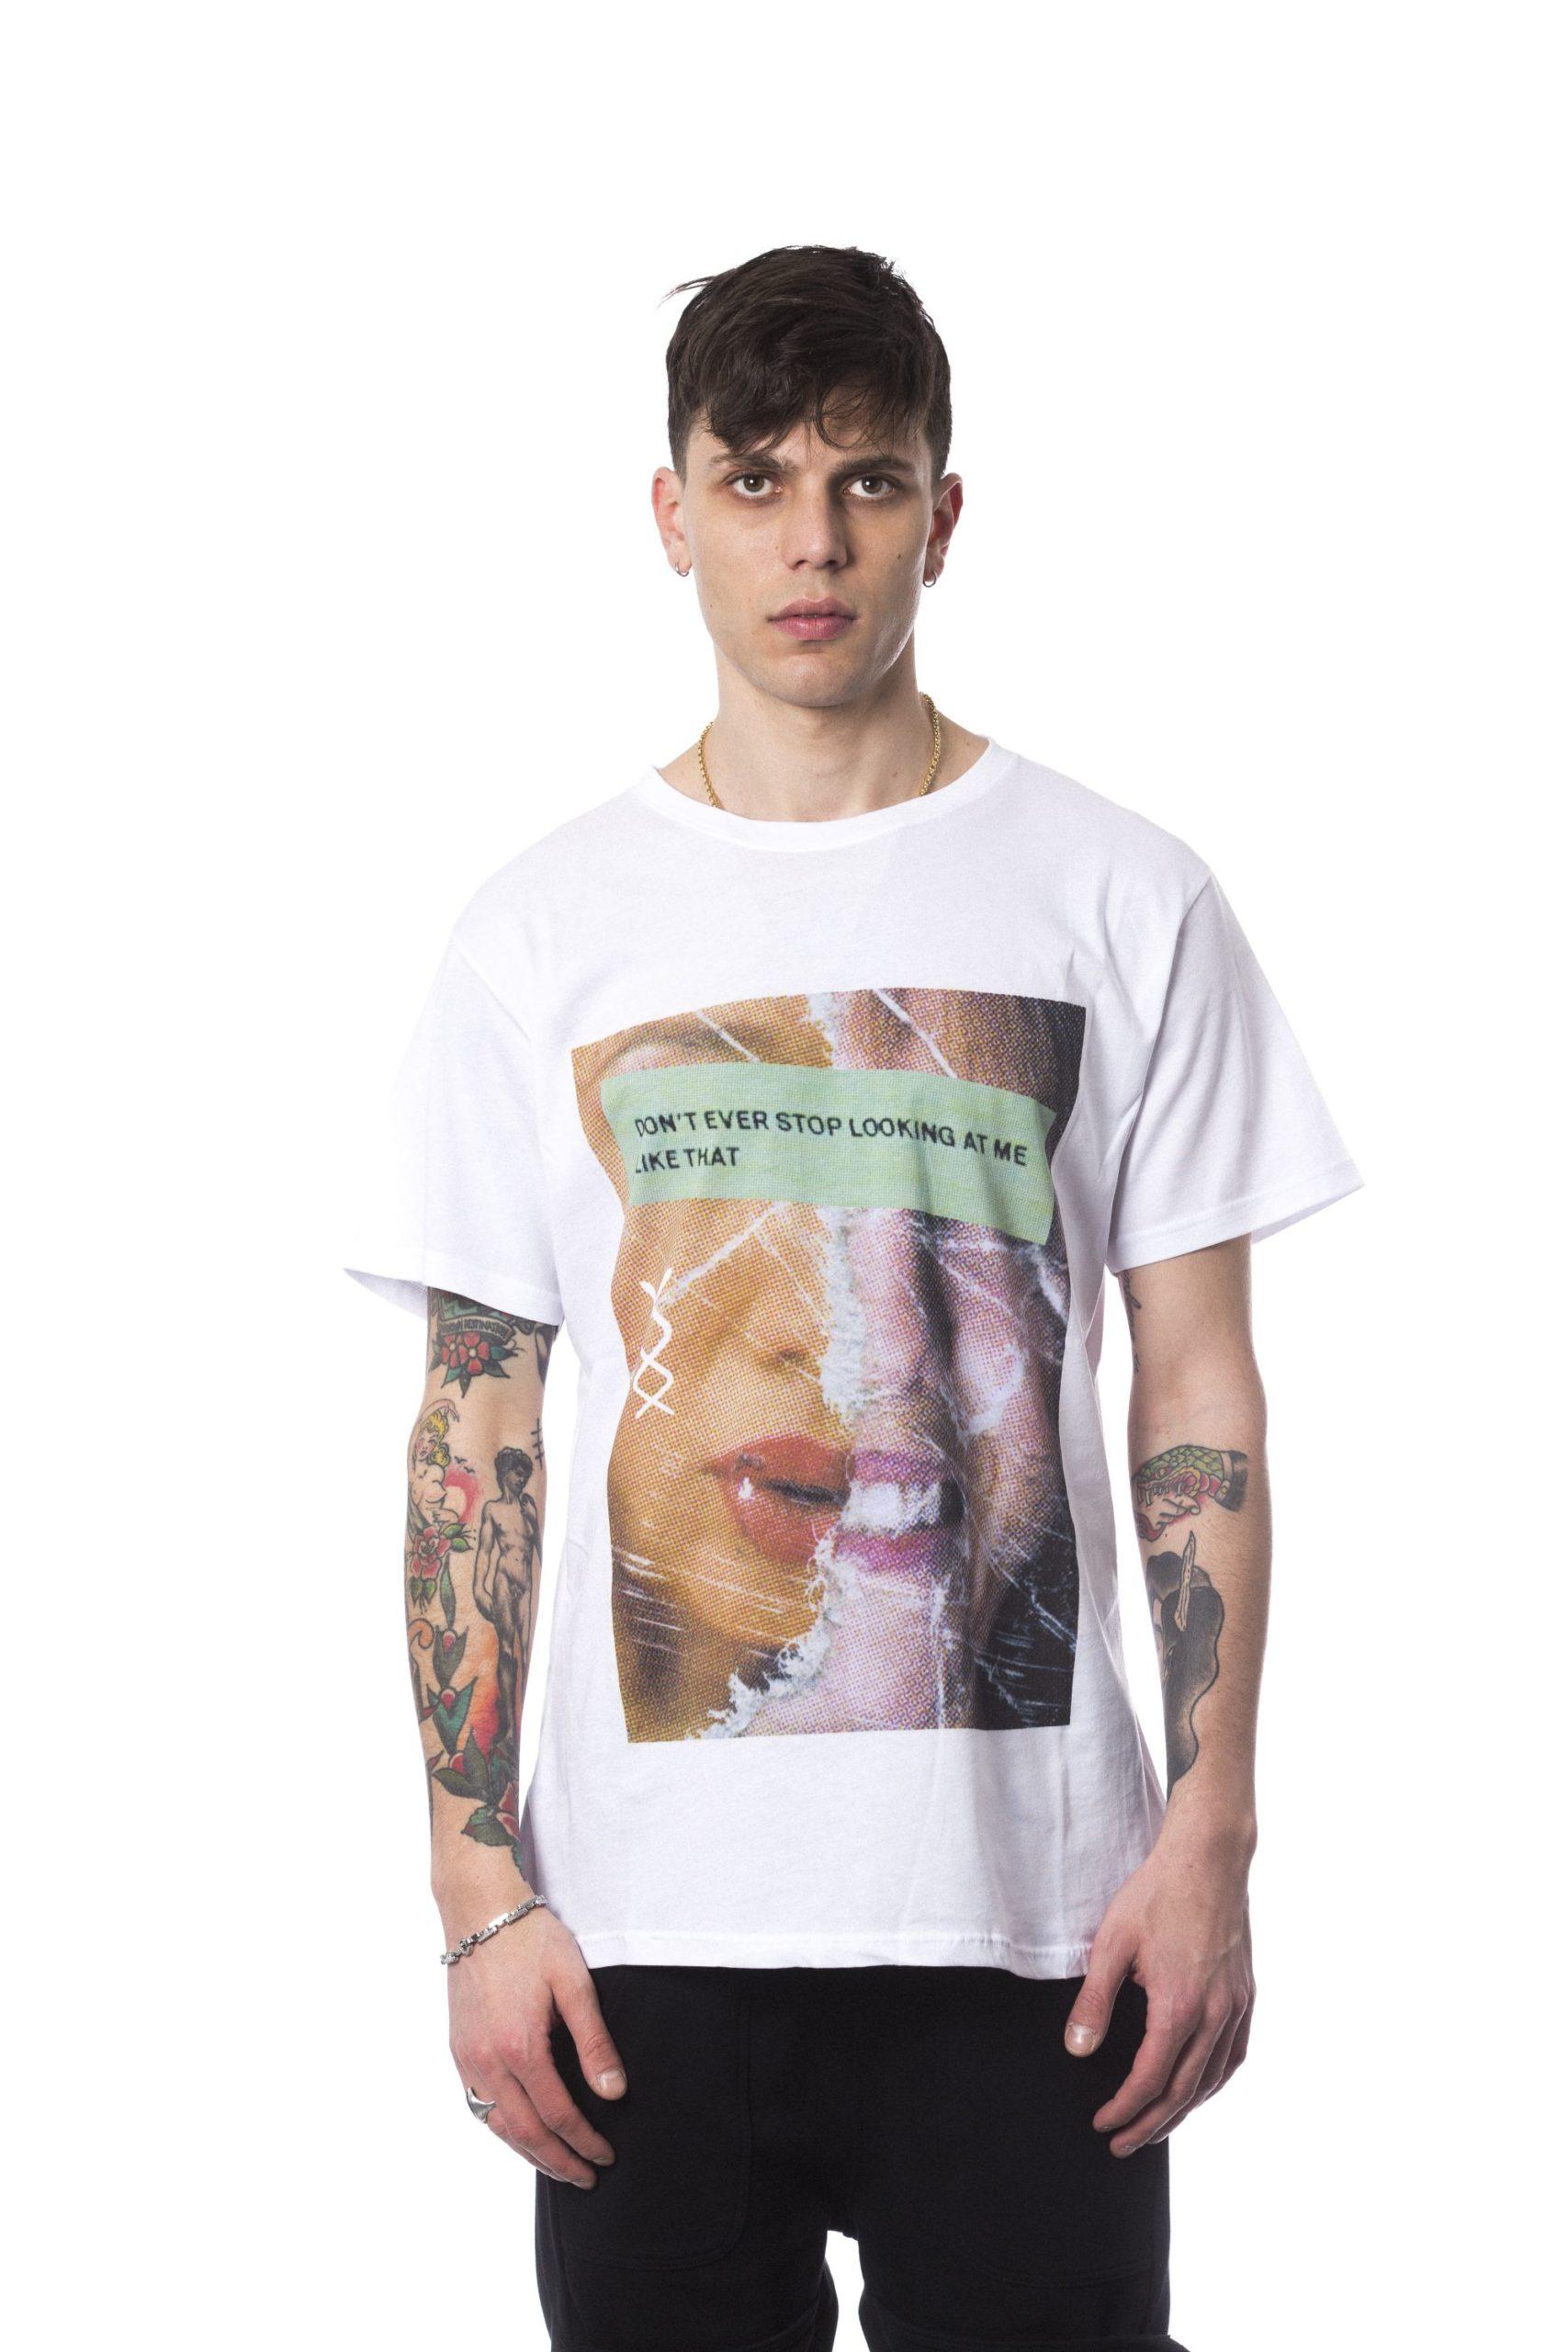 Nicolo Tonetto Men's Bianco T-Shirt White NI687549 - M